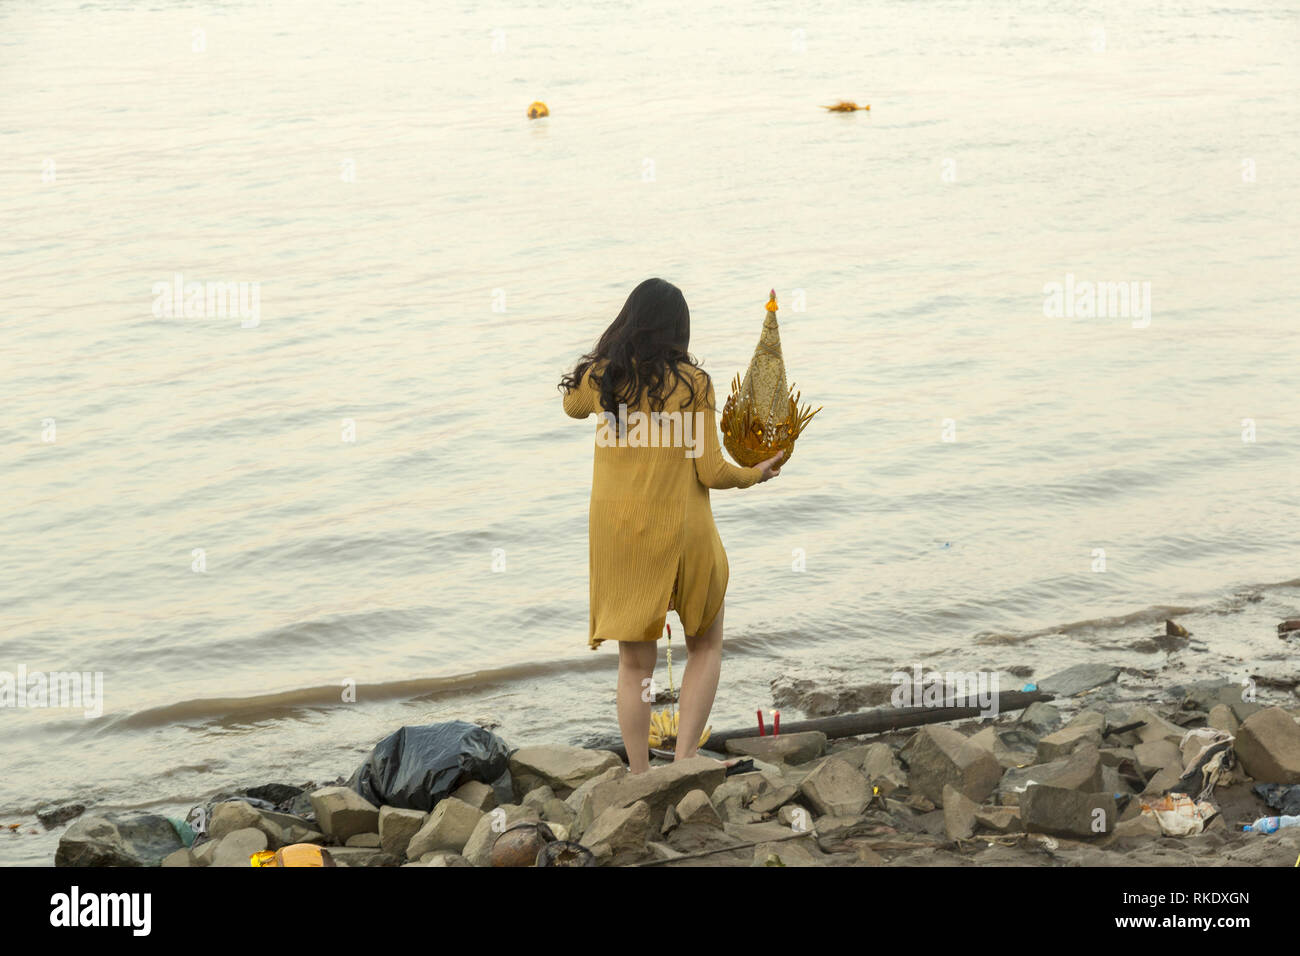 Prayer at the river bank in Phnom Penh, Cambodia - Stock Image